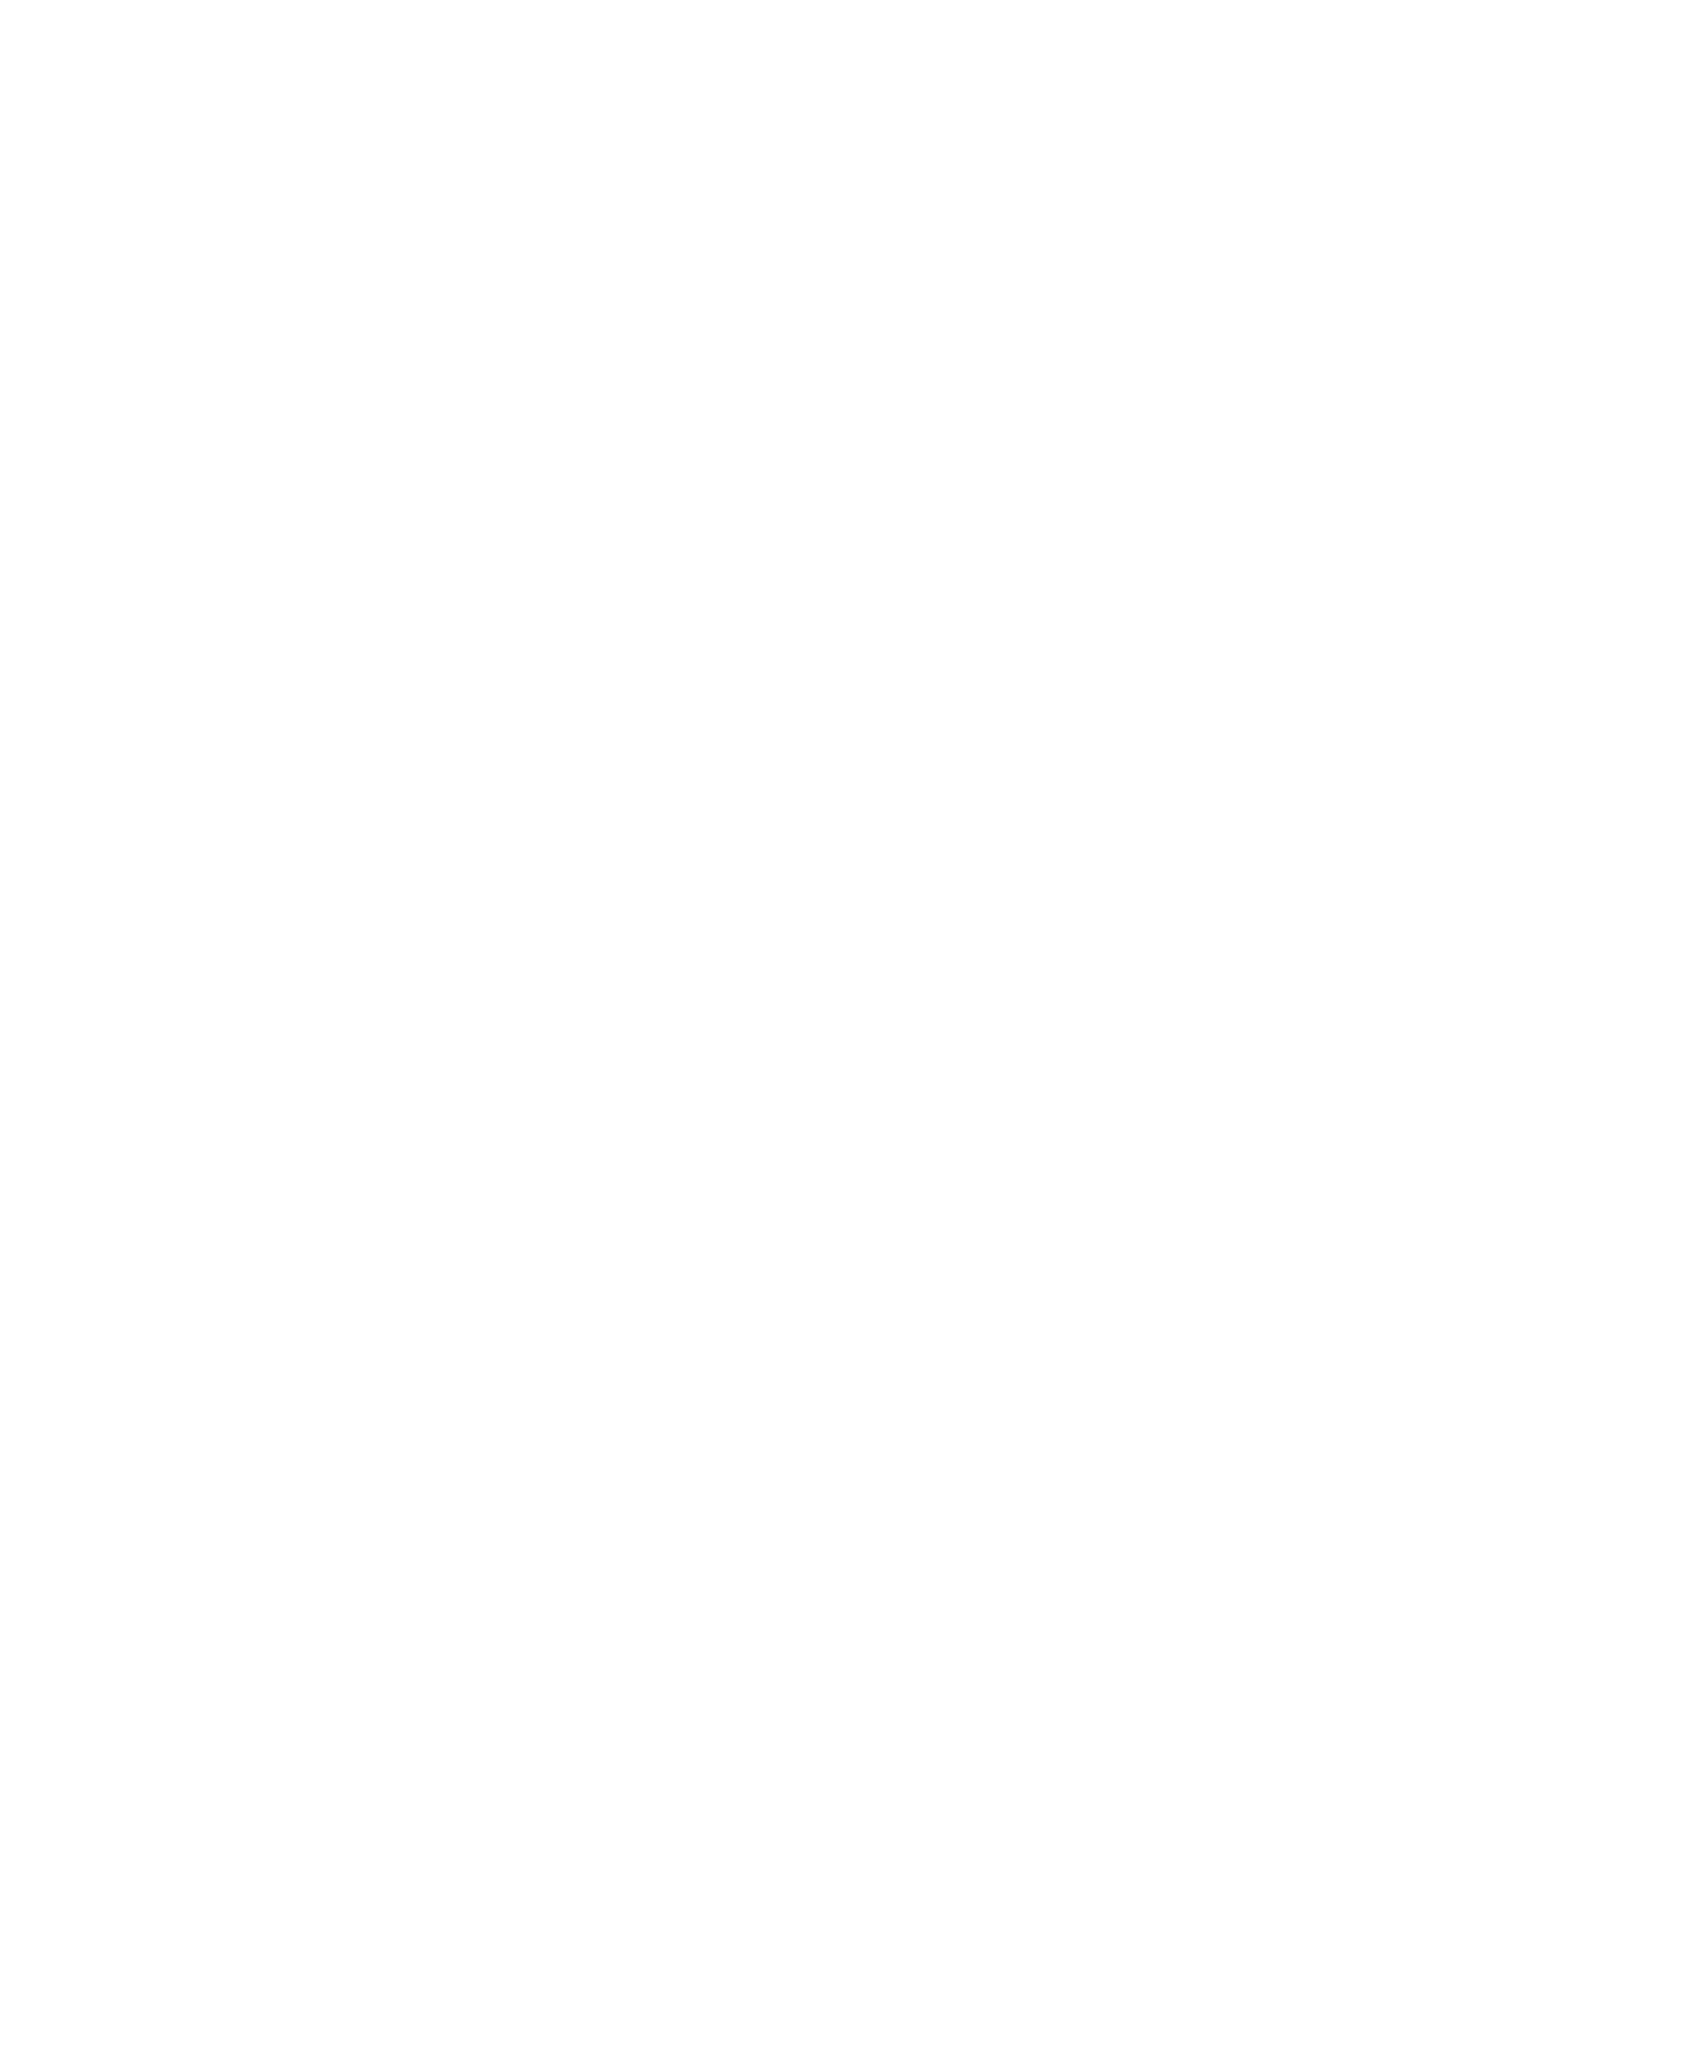 Tahoe Donner - Beach Club Marina - Marina Grill Logo